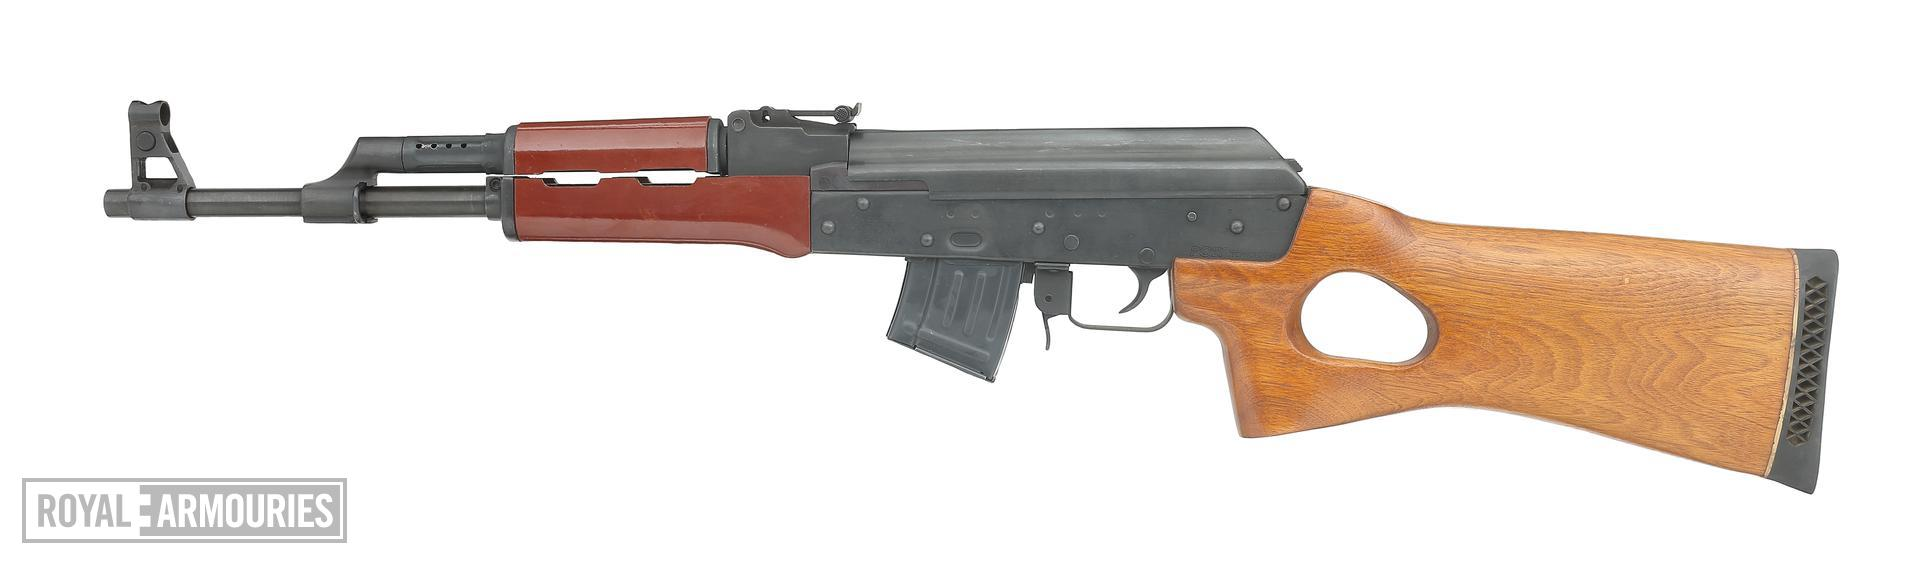 Centrefire self-loading rifle - Kalashnikov Model AKS-762